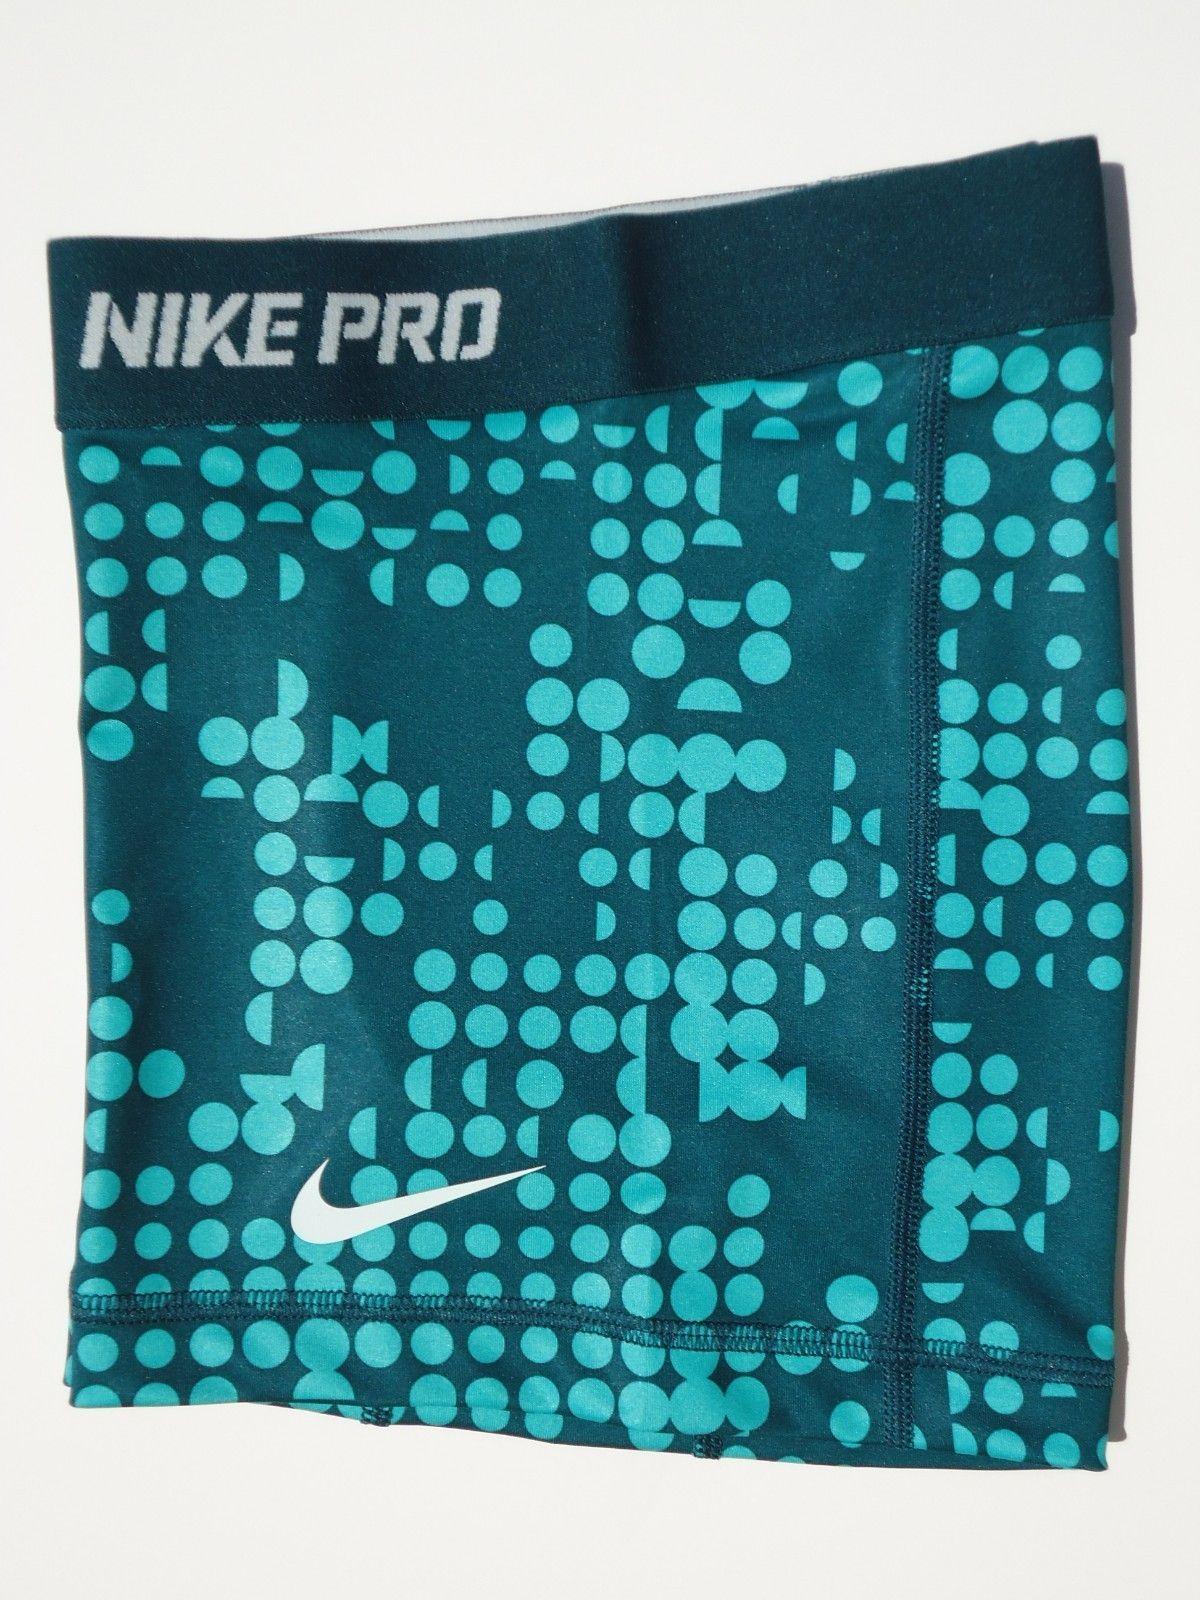 New Xs Nike Pro Core 2 5 Atomic Teal Print Womens Compression Shorts X Sml Ebay Nike Pros Nike Pro Shorts Nike Pro Spandex